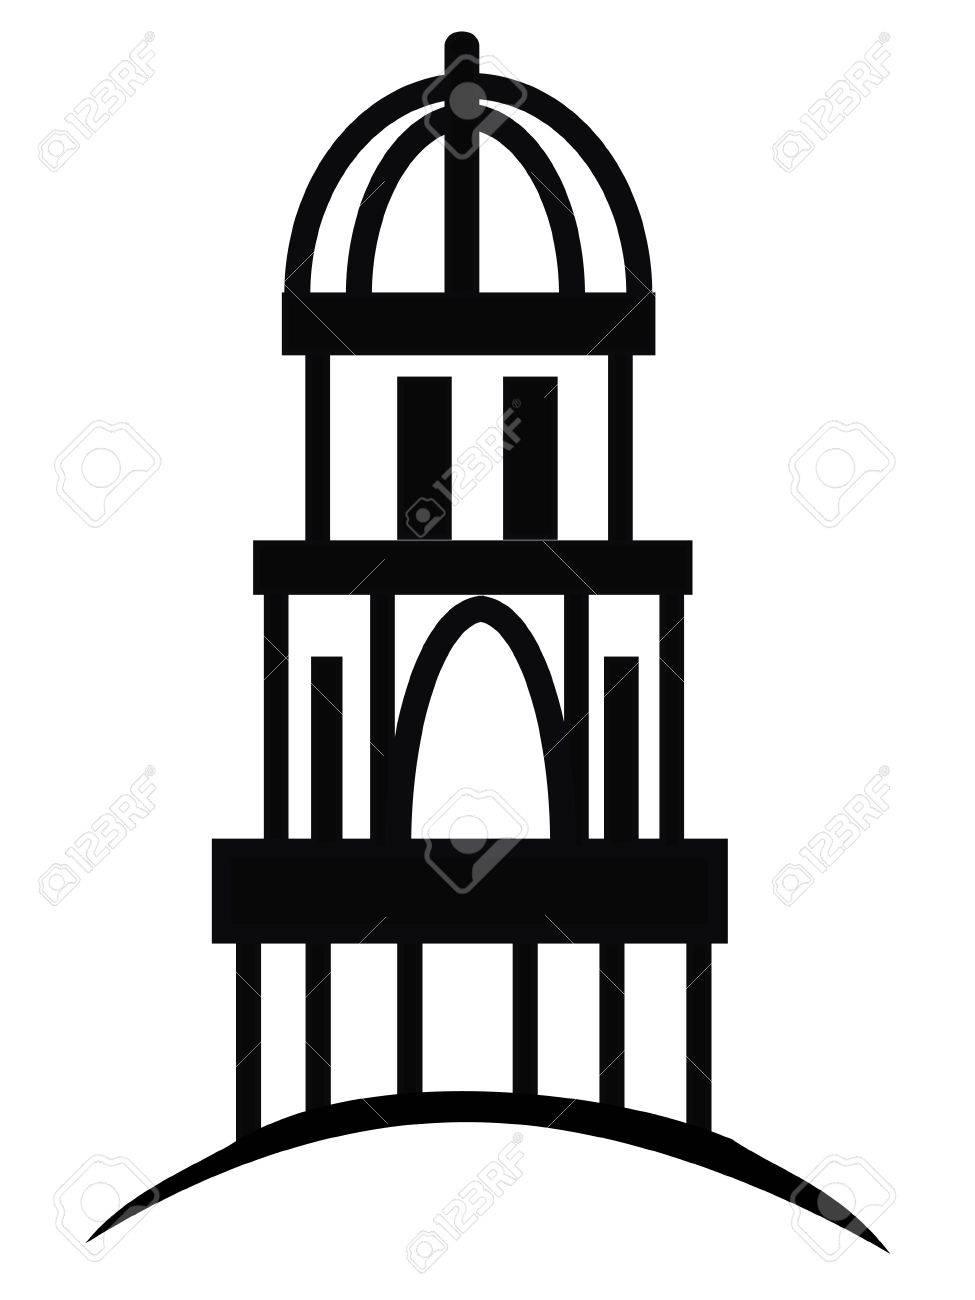 Temple or cupola silhouette logo Stock Vector - 10346175